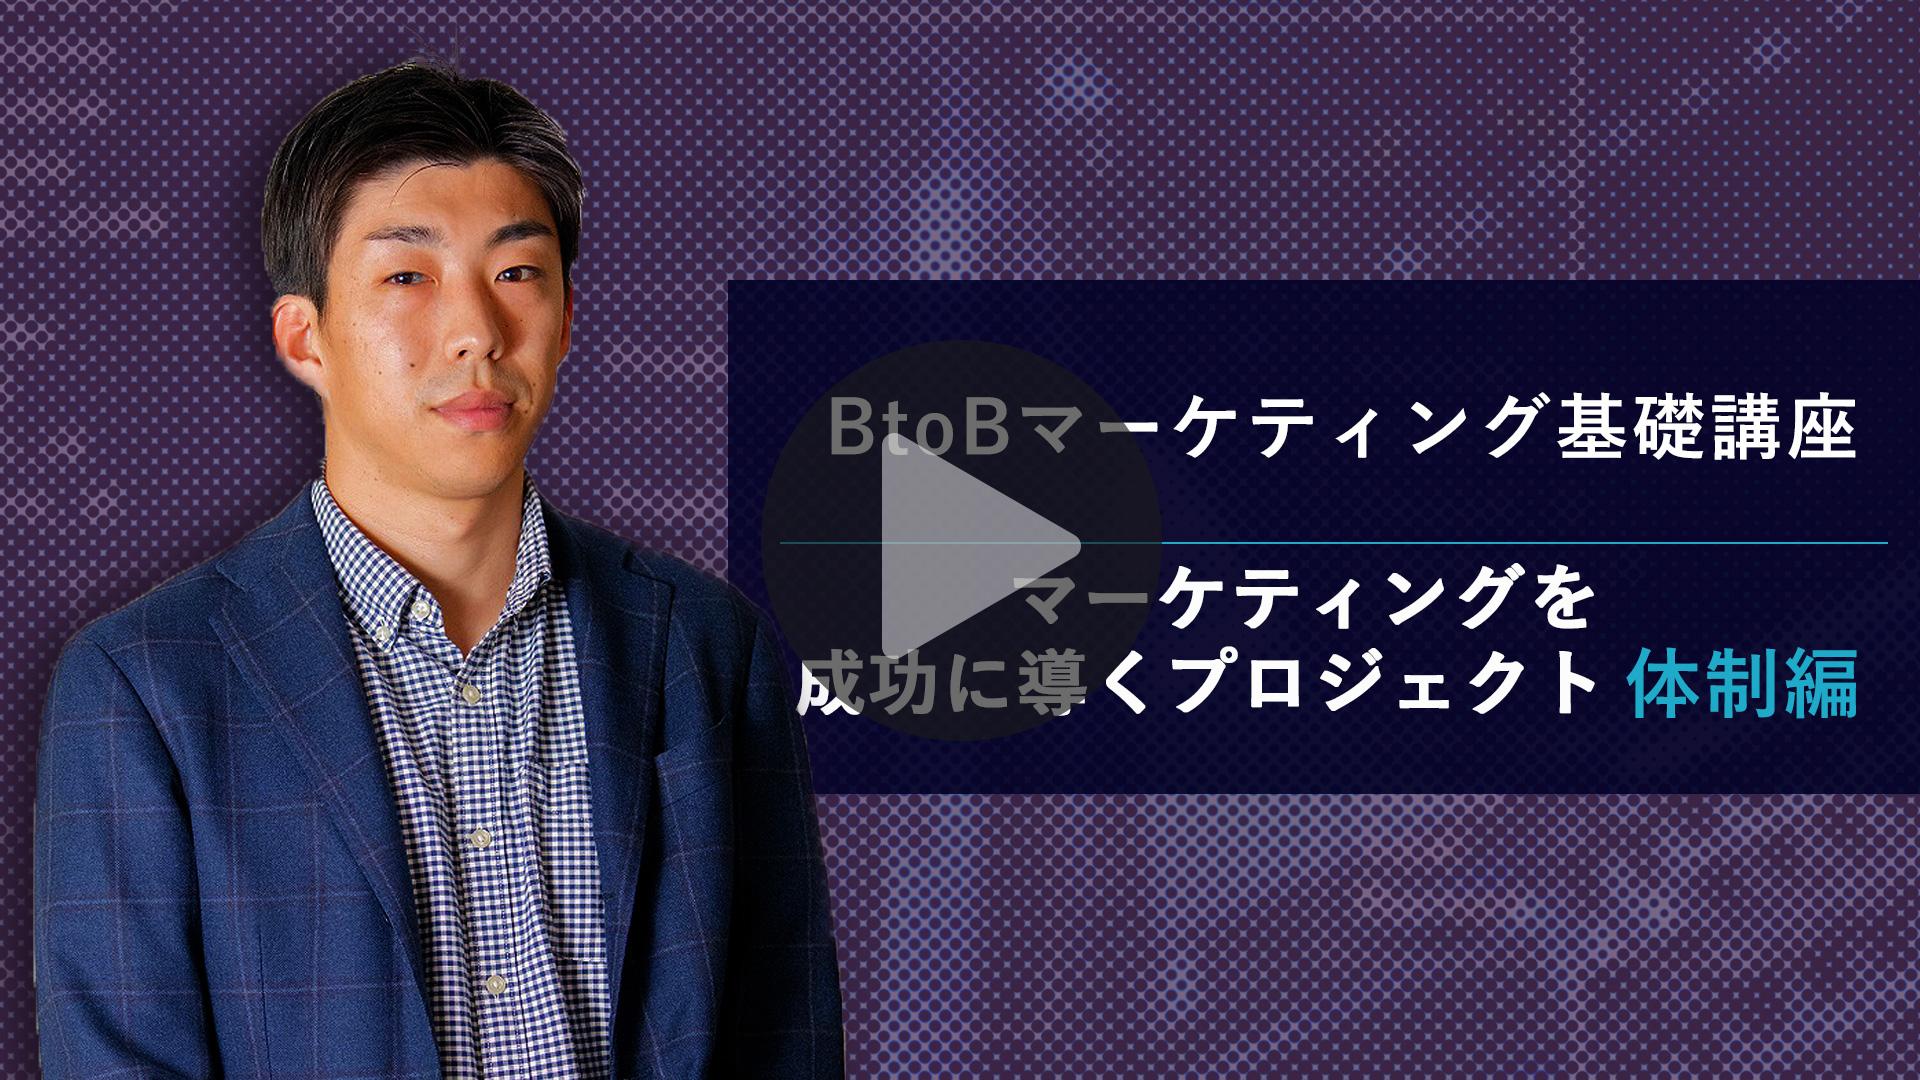 BtoBマーケティング概論